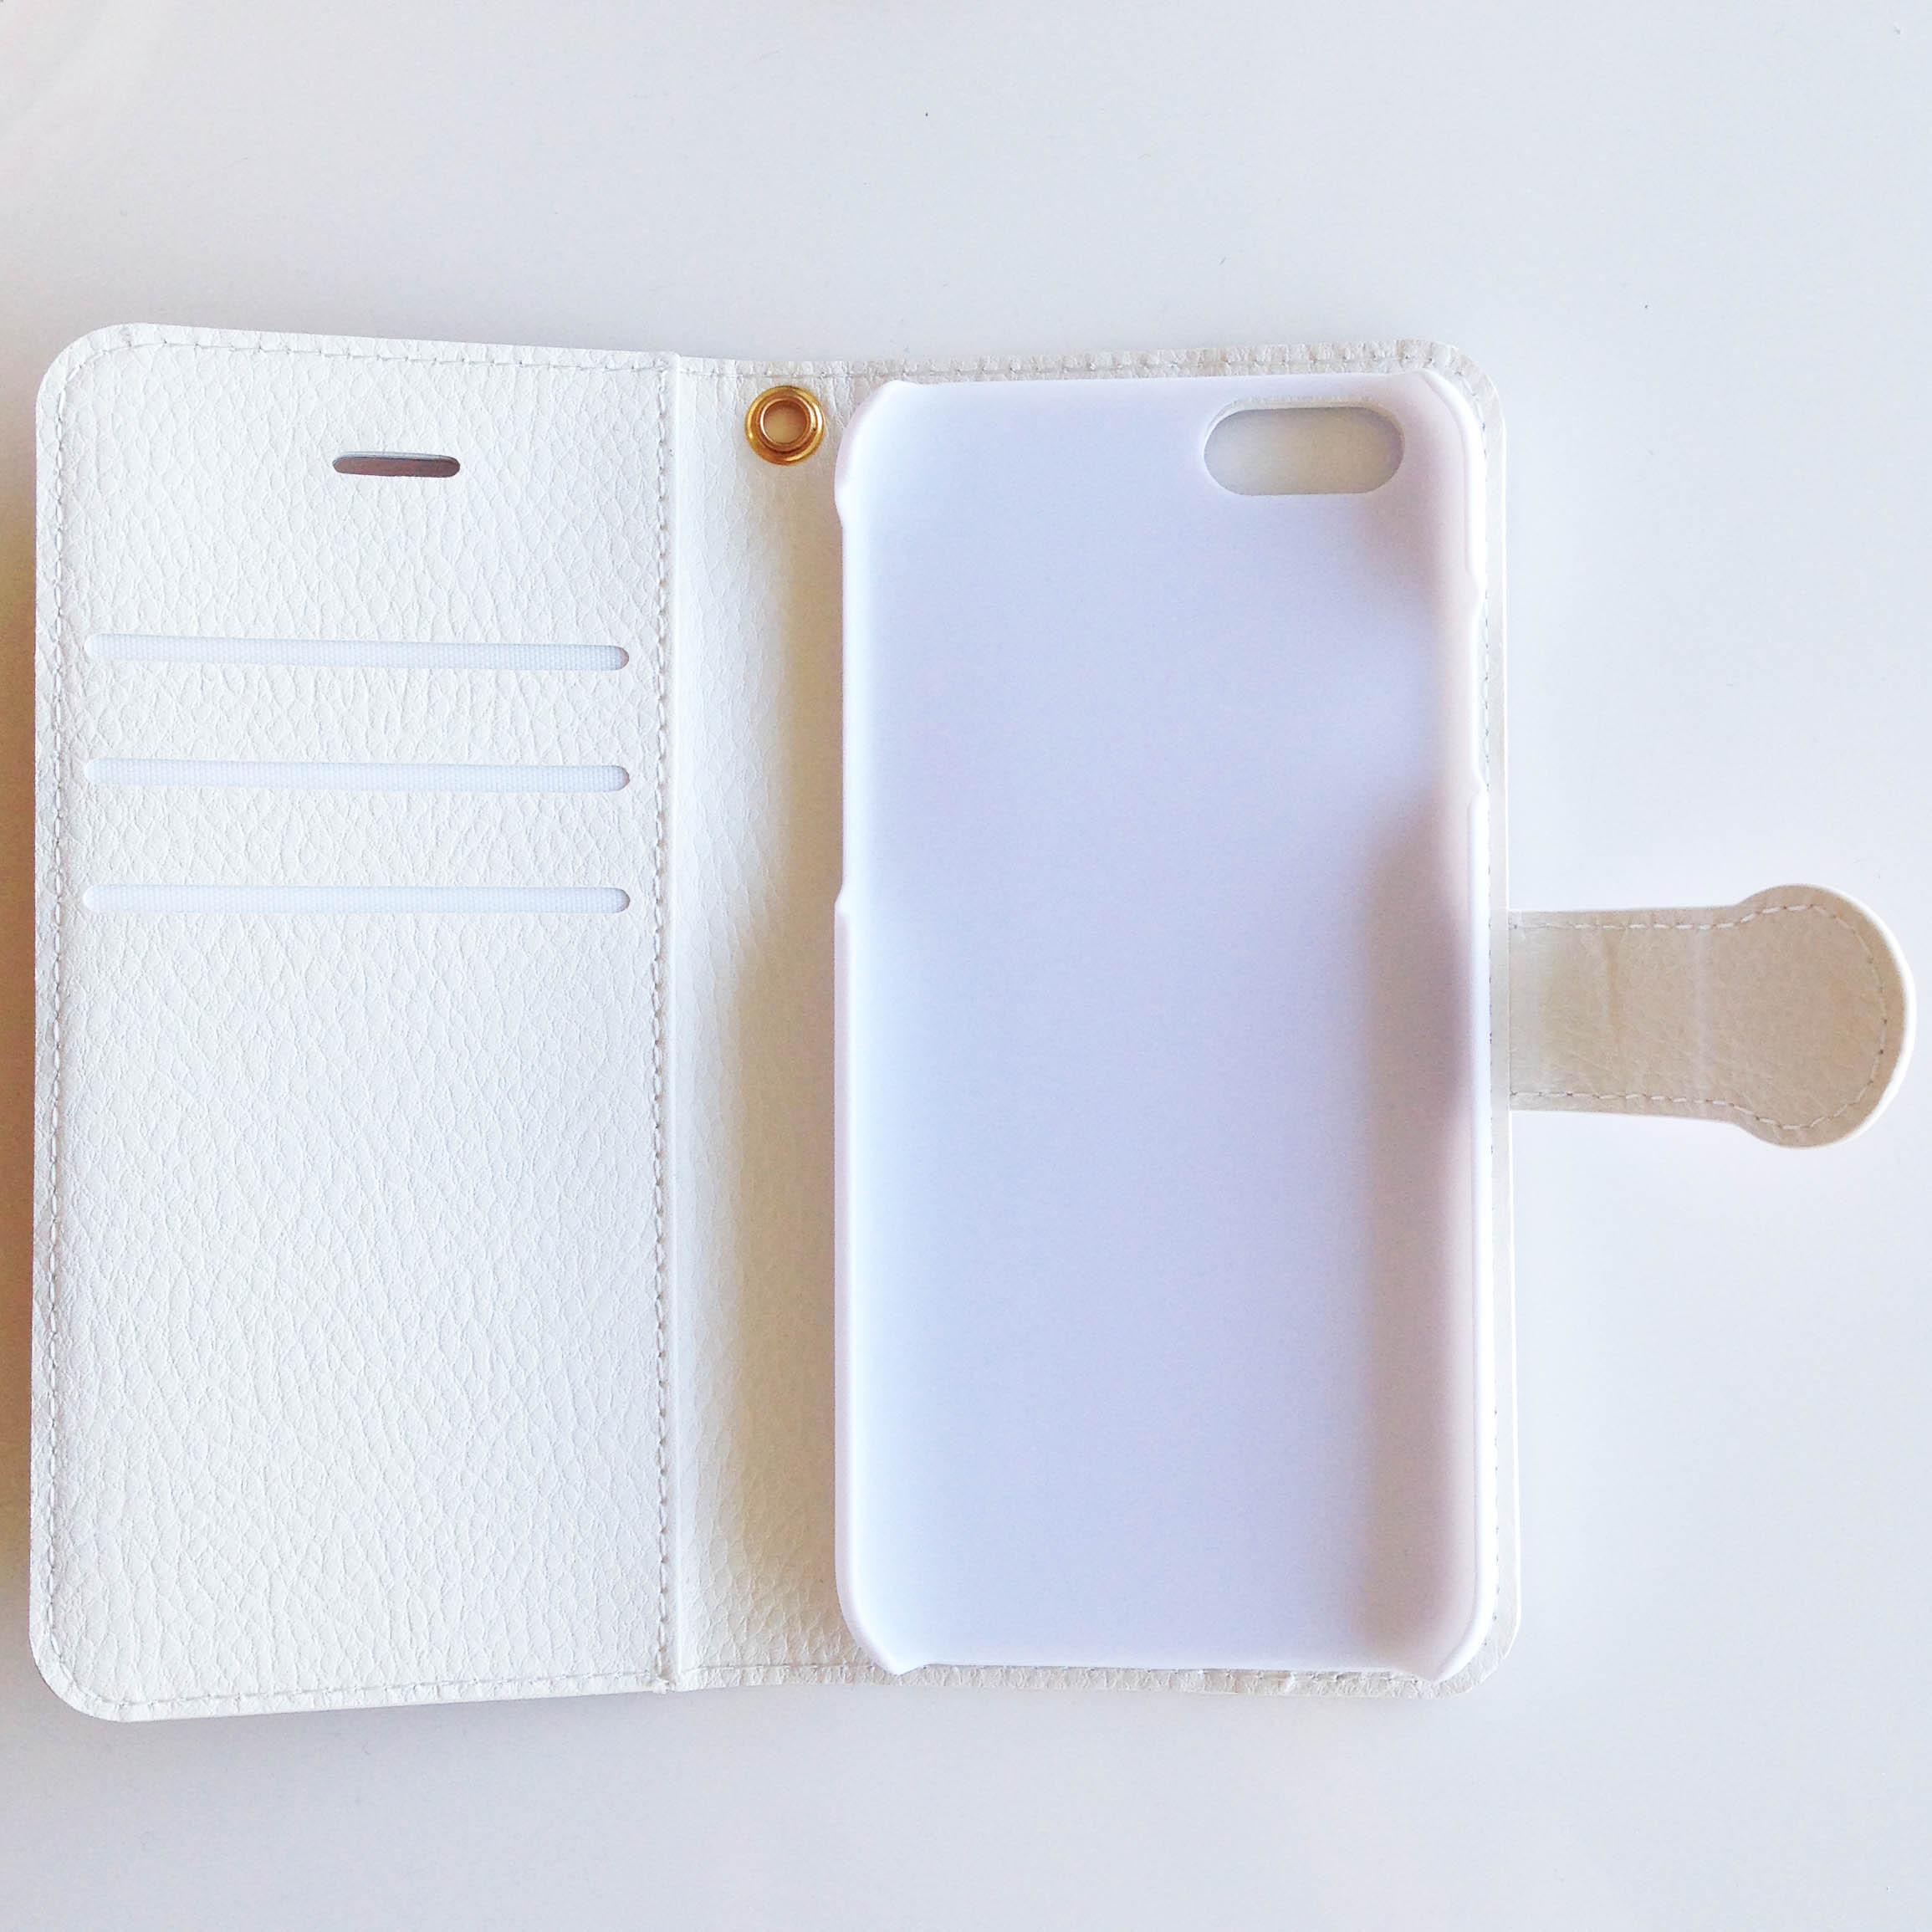 (iPhone)リーズの結婚 手帳型スマホケース - 画像5